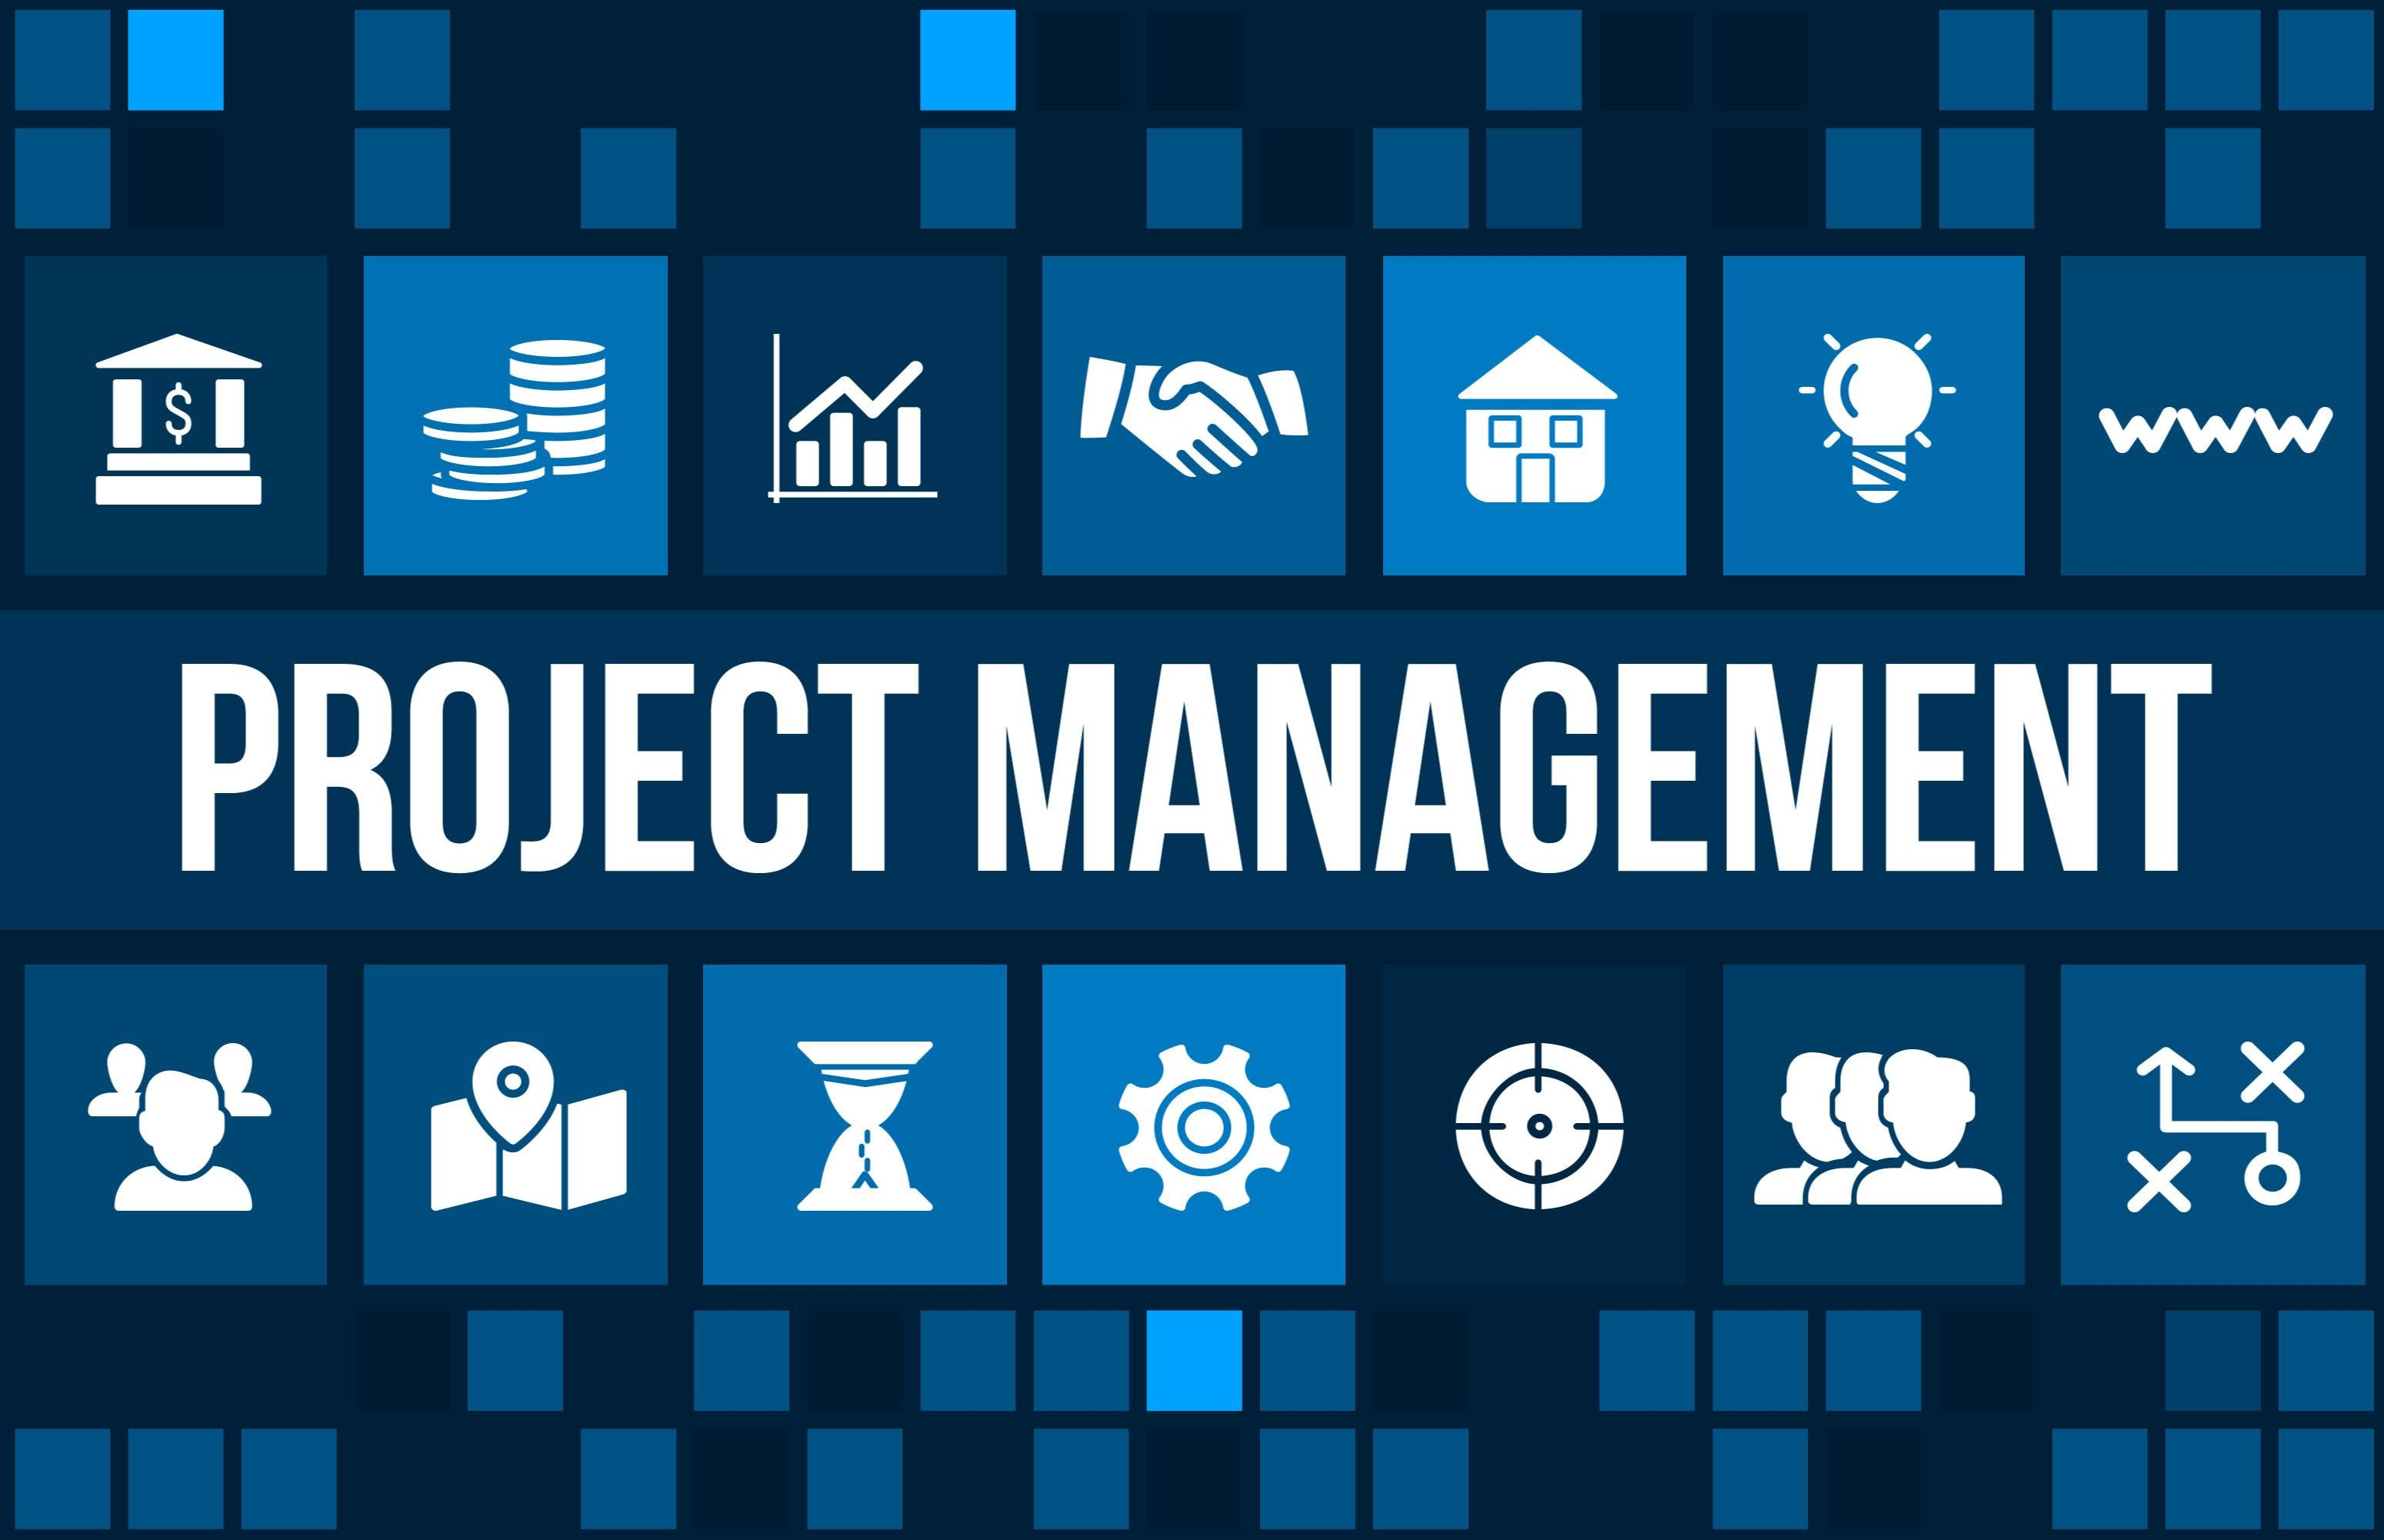 Iec Of Oregon Presents The 2018 Project Management Series Tigard